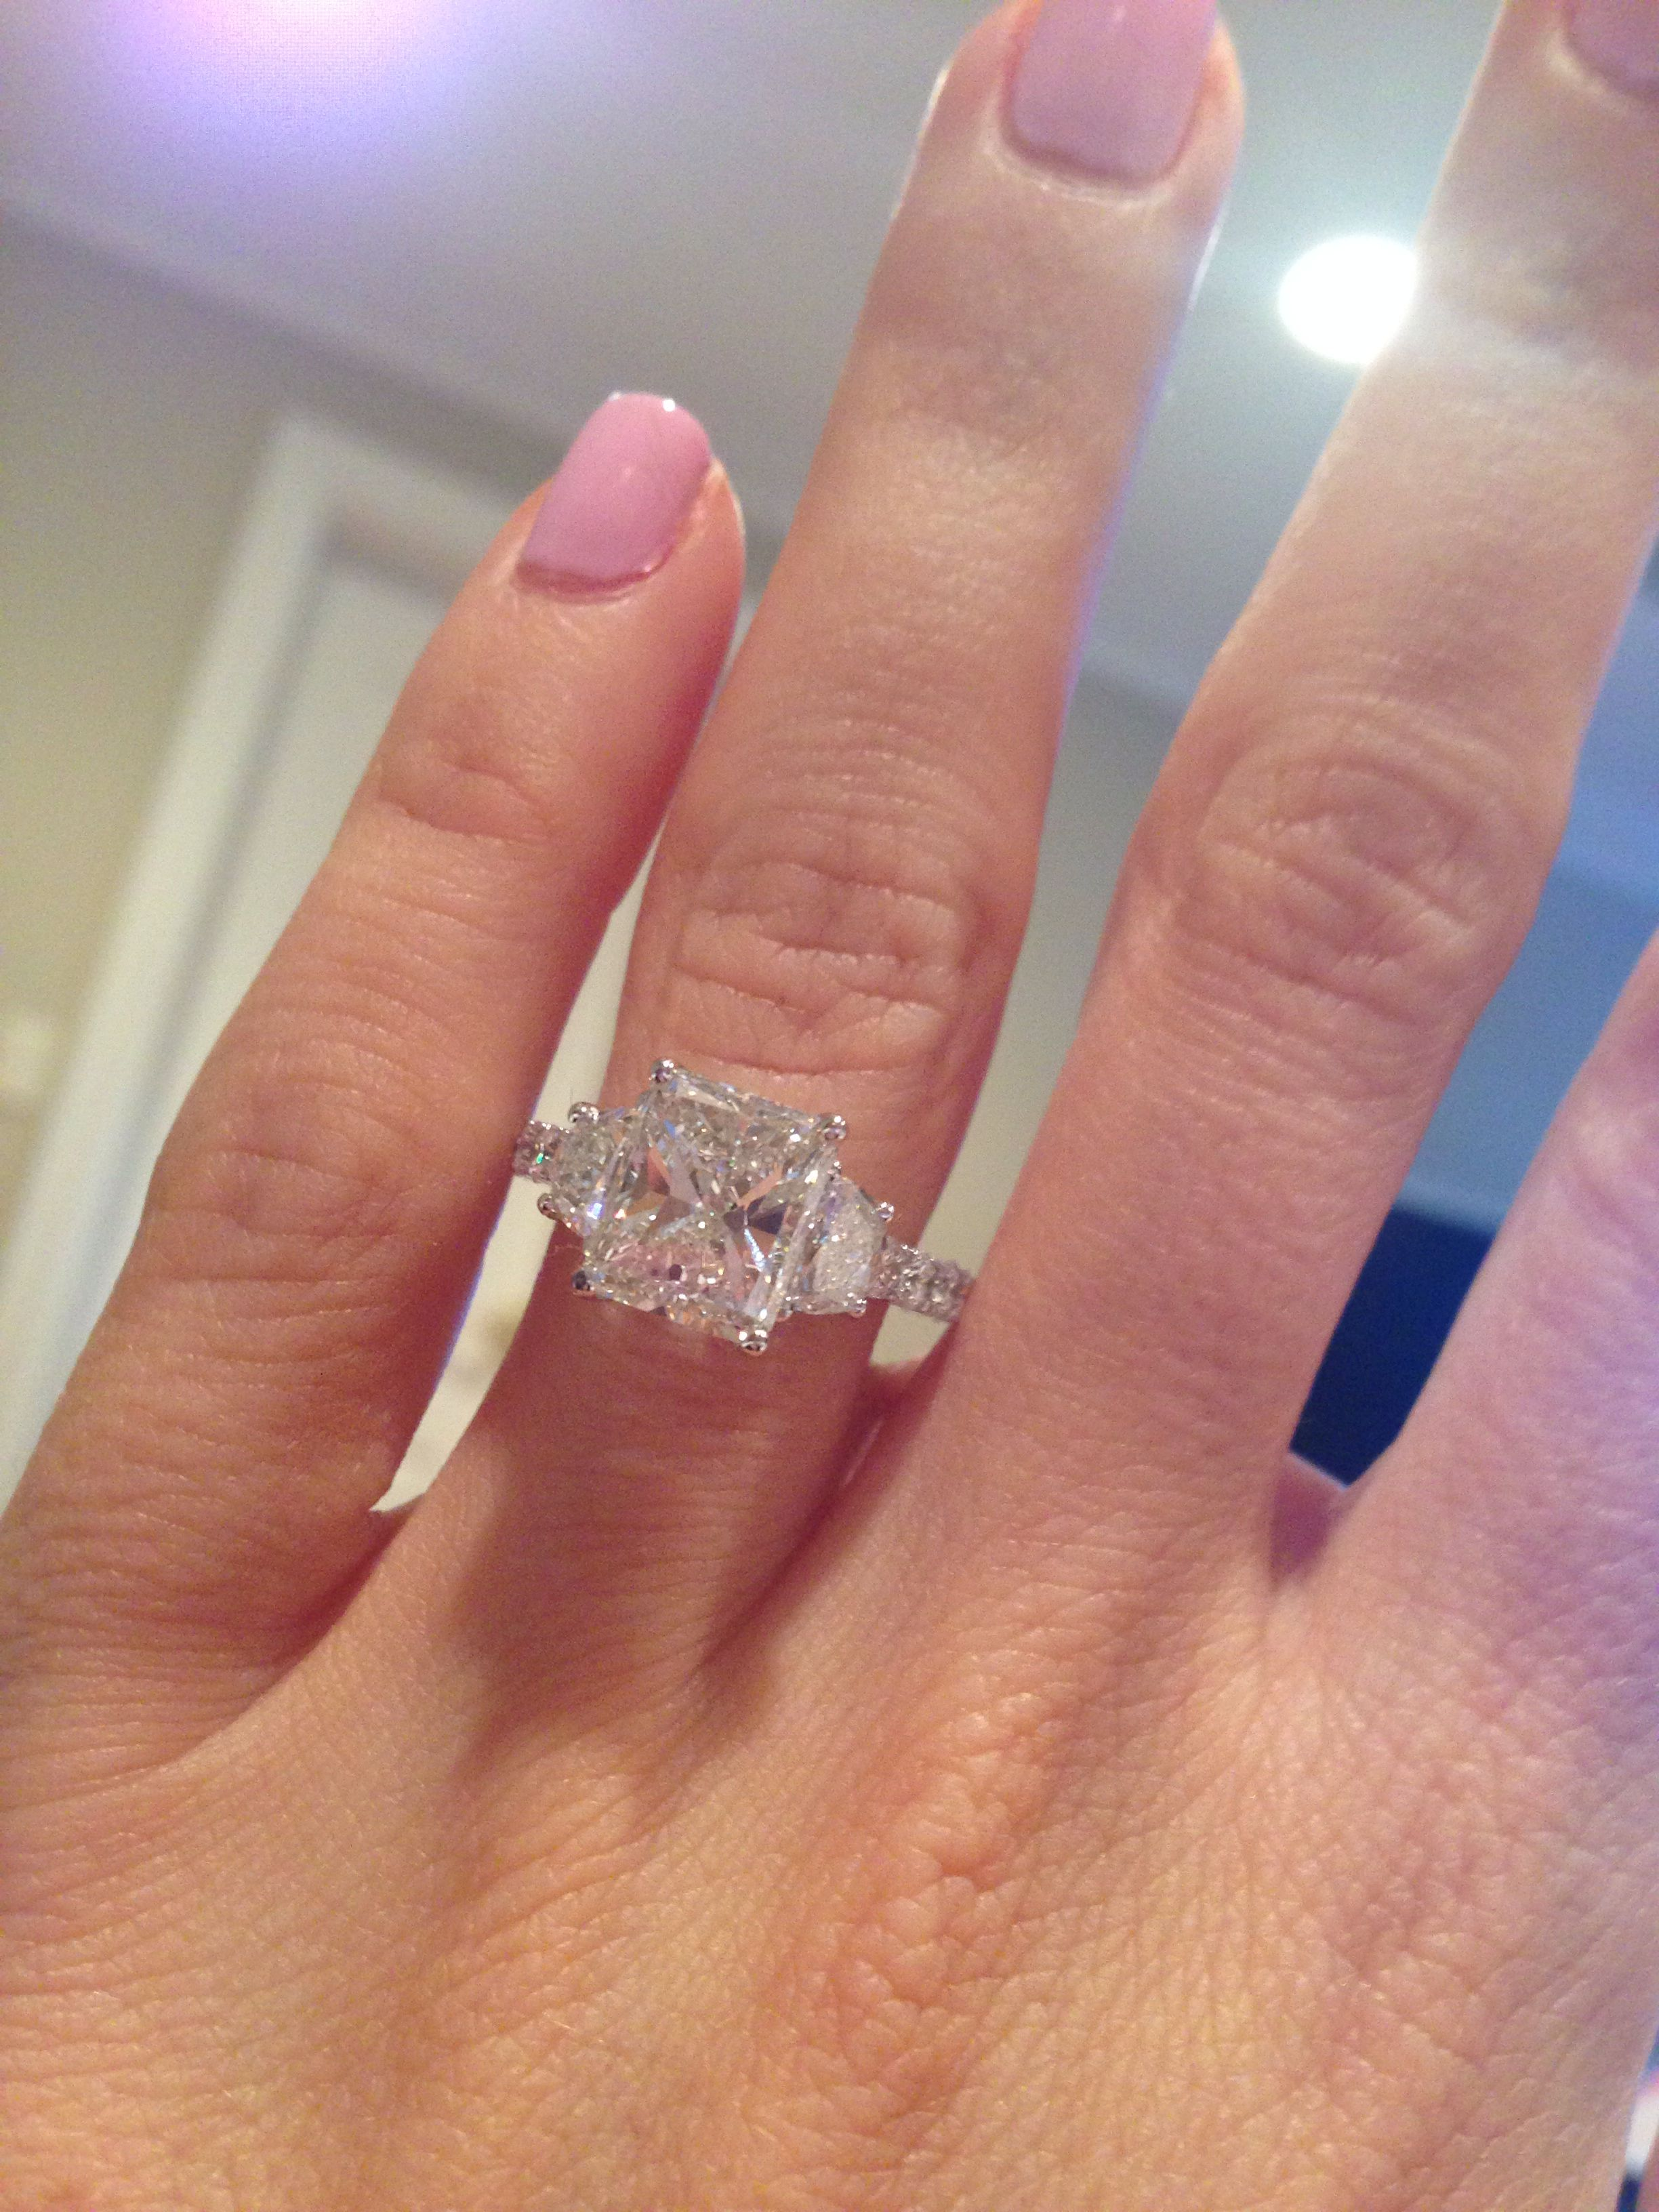 Greta tar here it is my radiant threestone engagement ring inlove